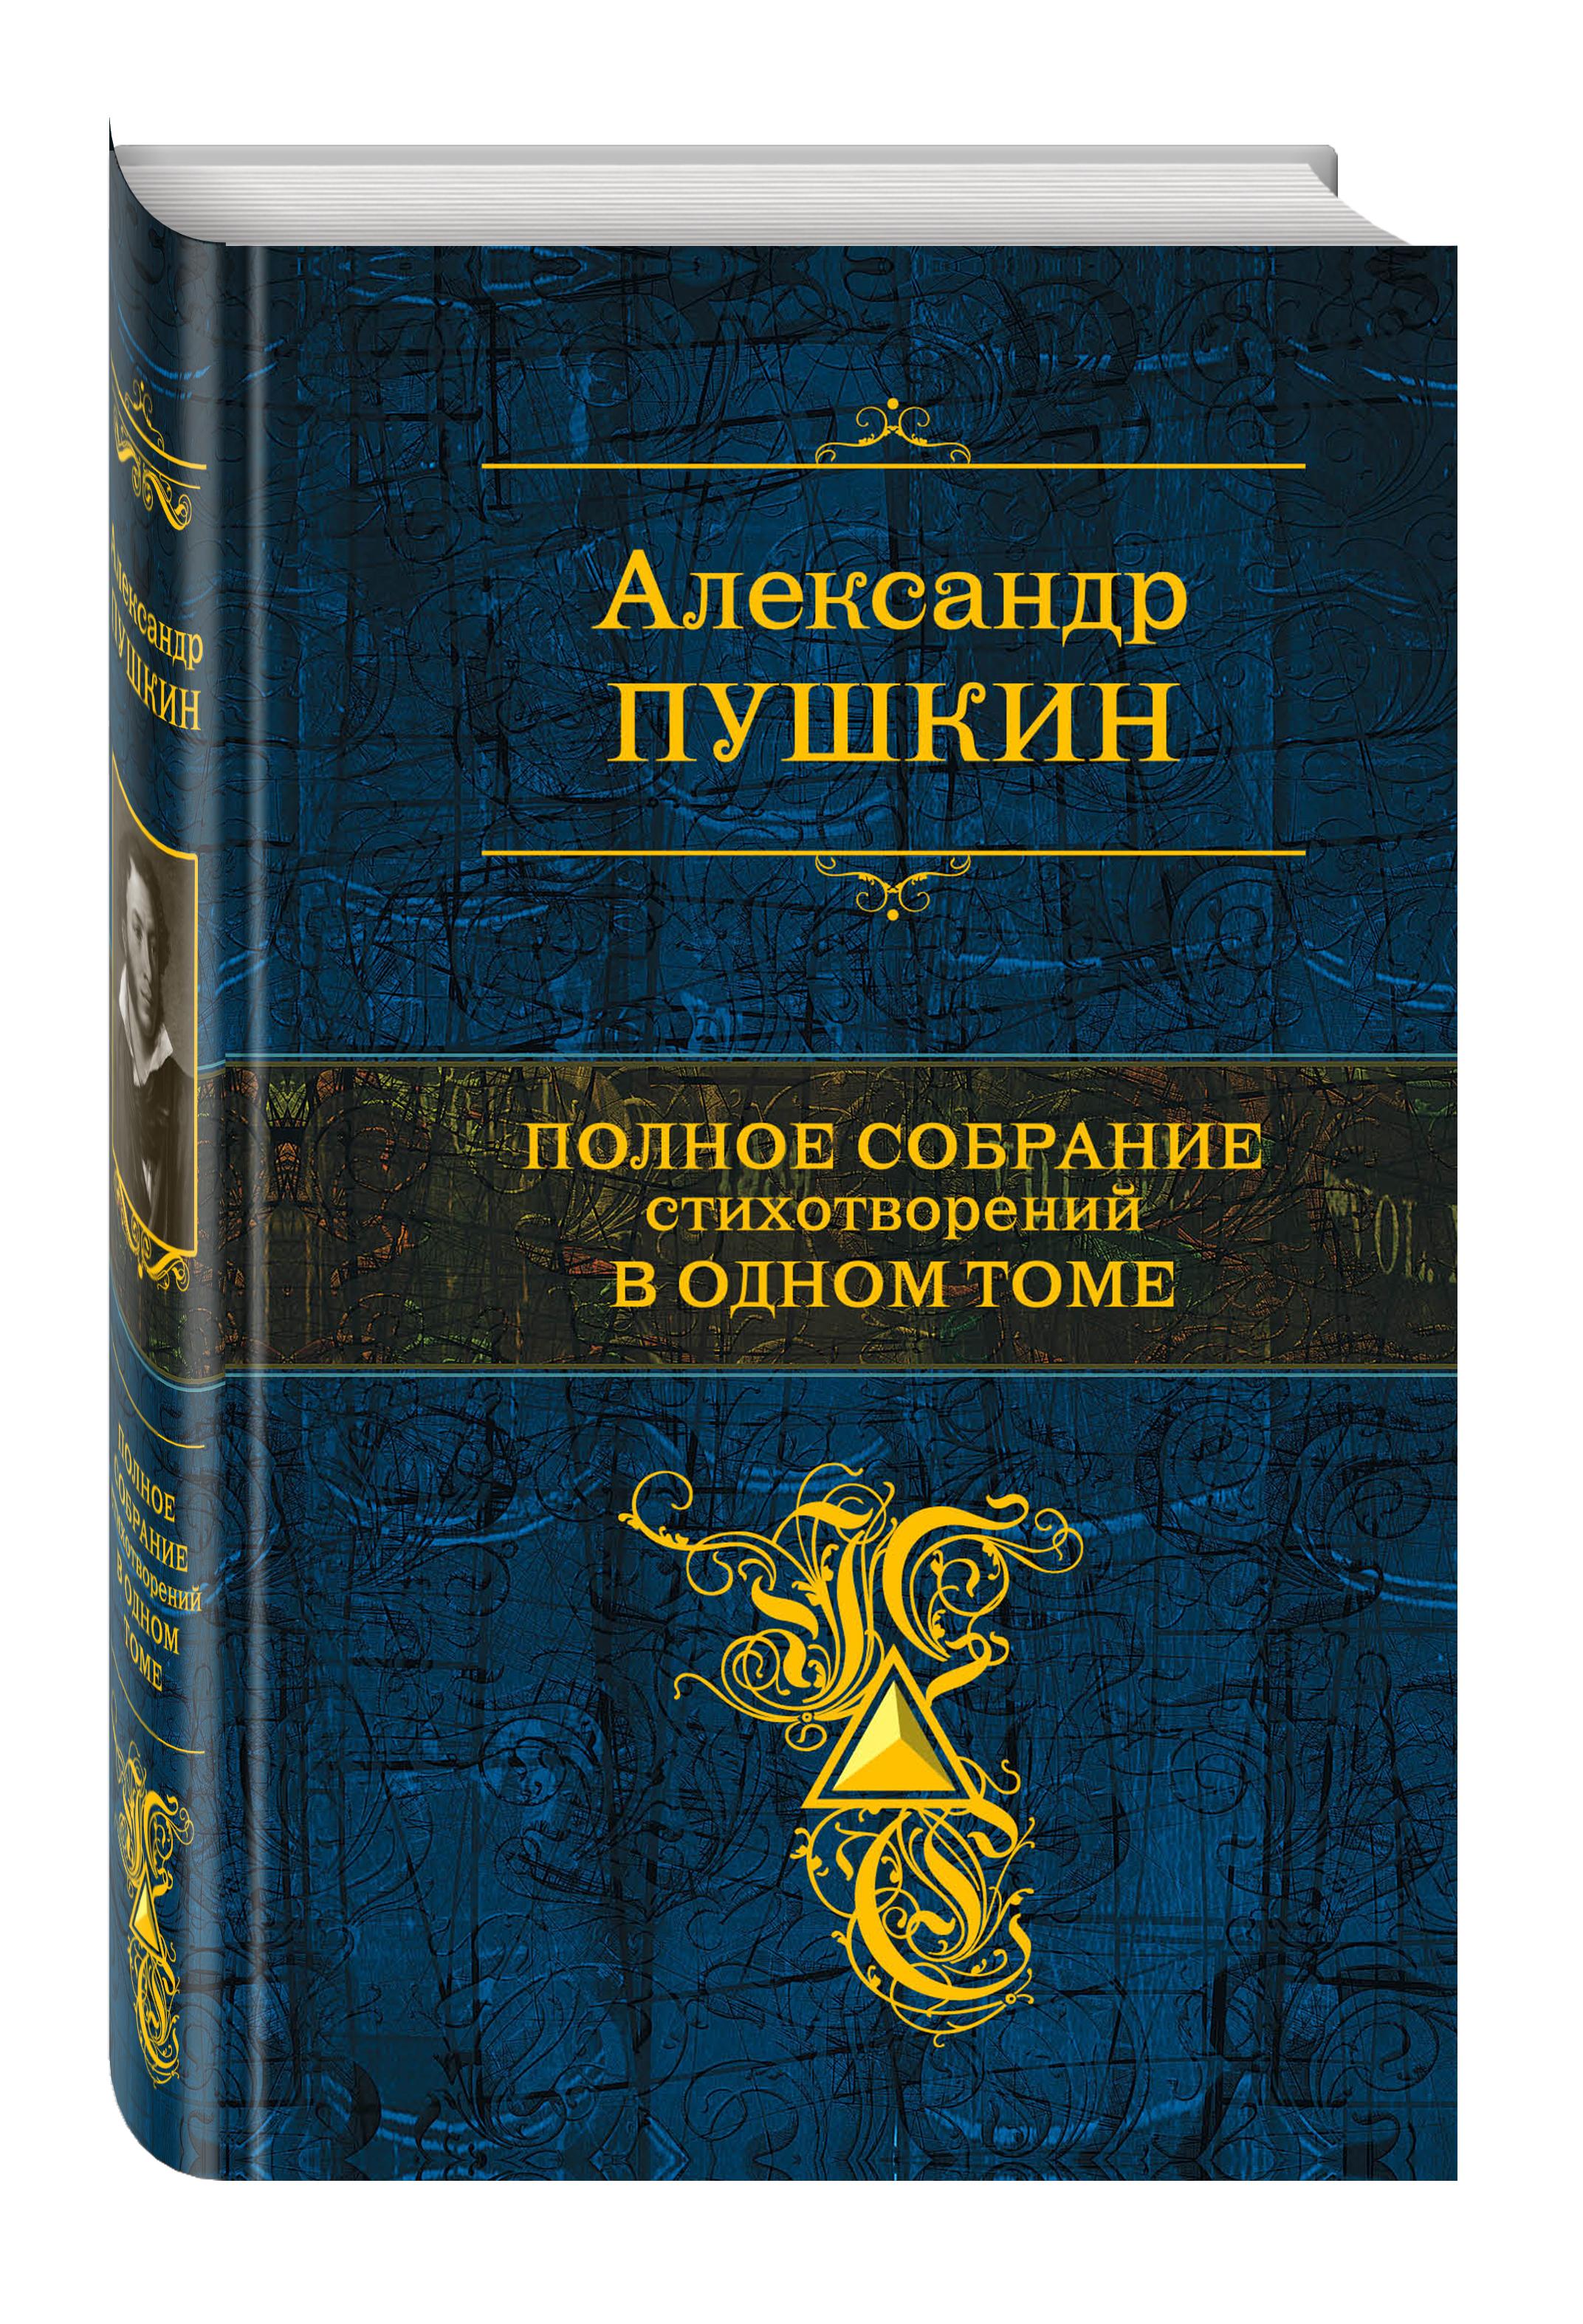 Александр Пушкин Полное собрание стихотворений в одном томе